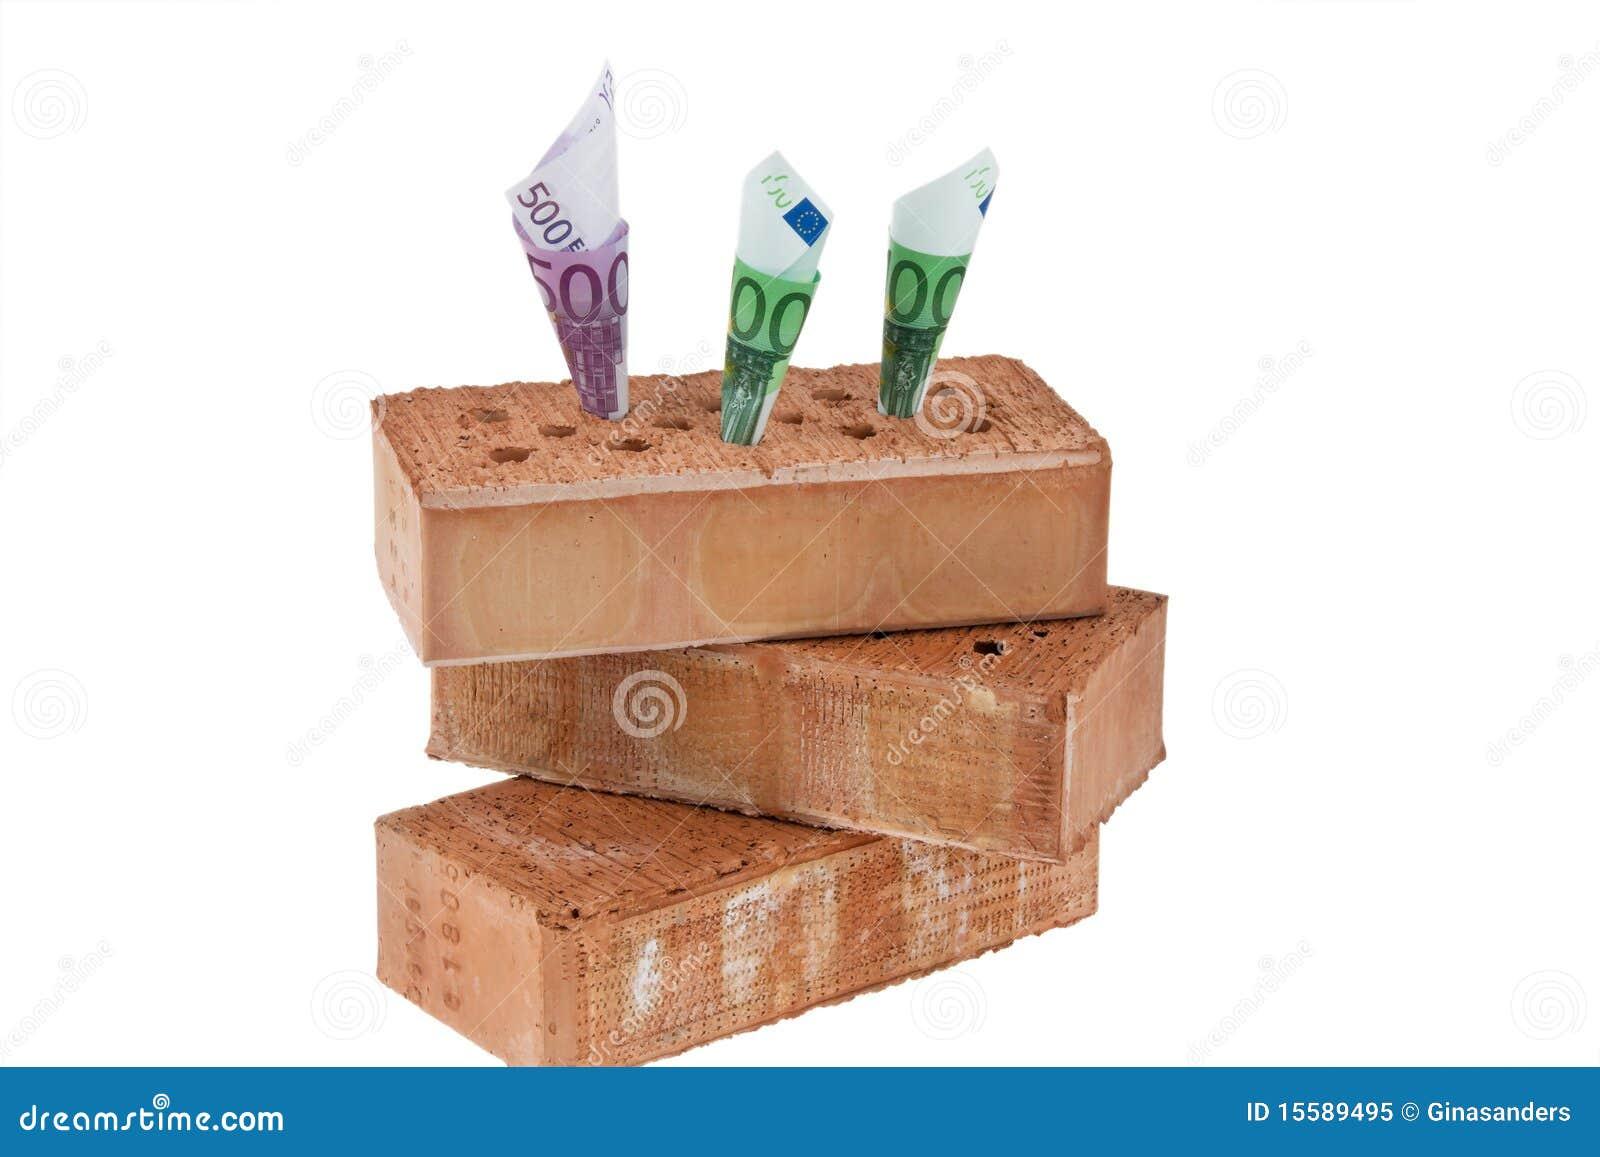 Free stock photo construction financing building societies brick